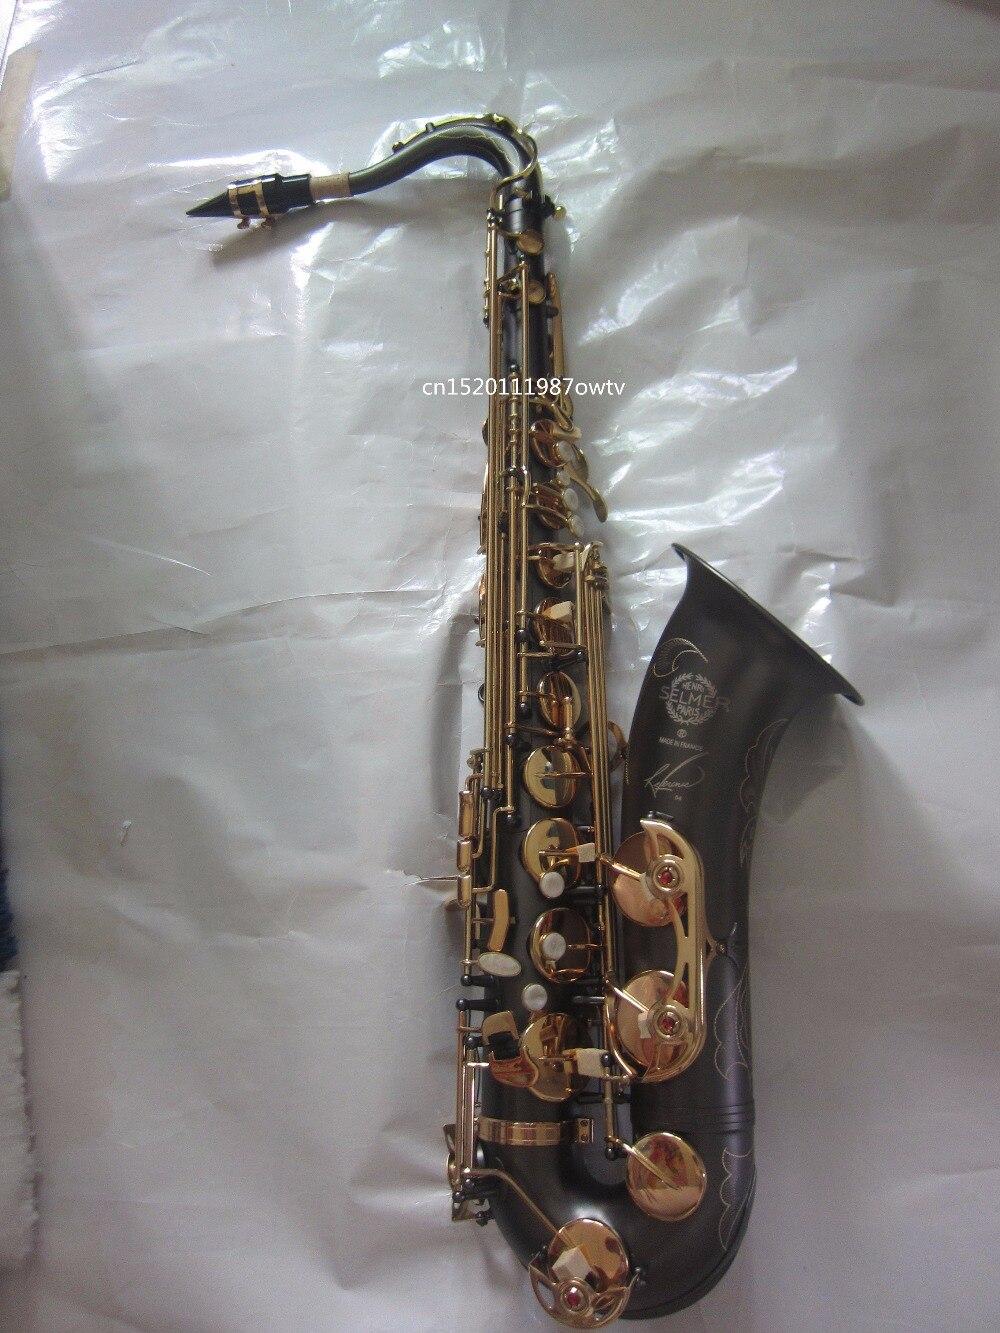 FREE SHIPPING selmer 54 tenor saxophone wind B flat original matt black for gold inscription carved tenor saxophone instrument 54 selmer b flat saxophone tenor antique copper free shipping sound quality promotions sax